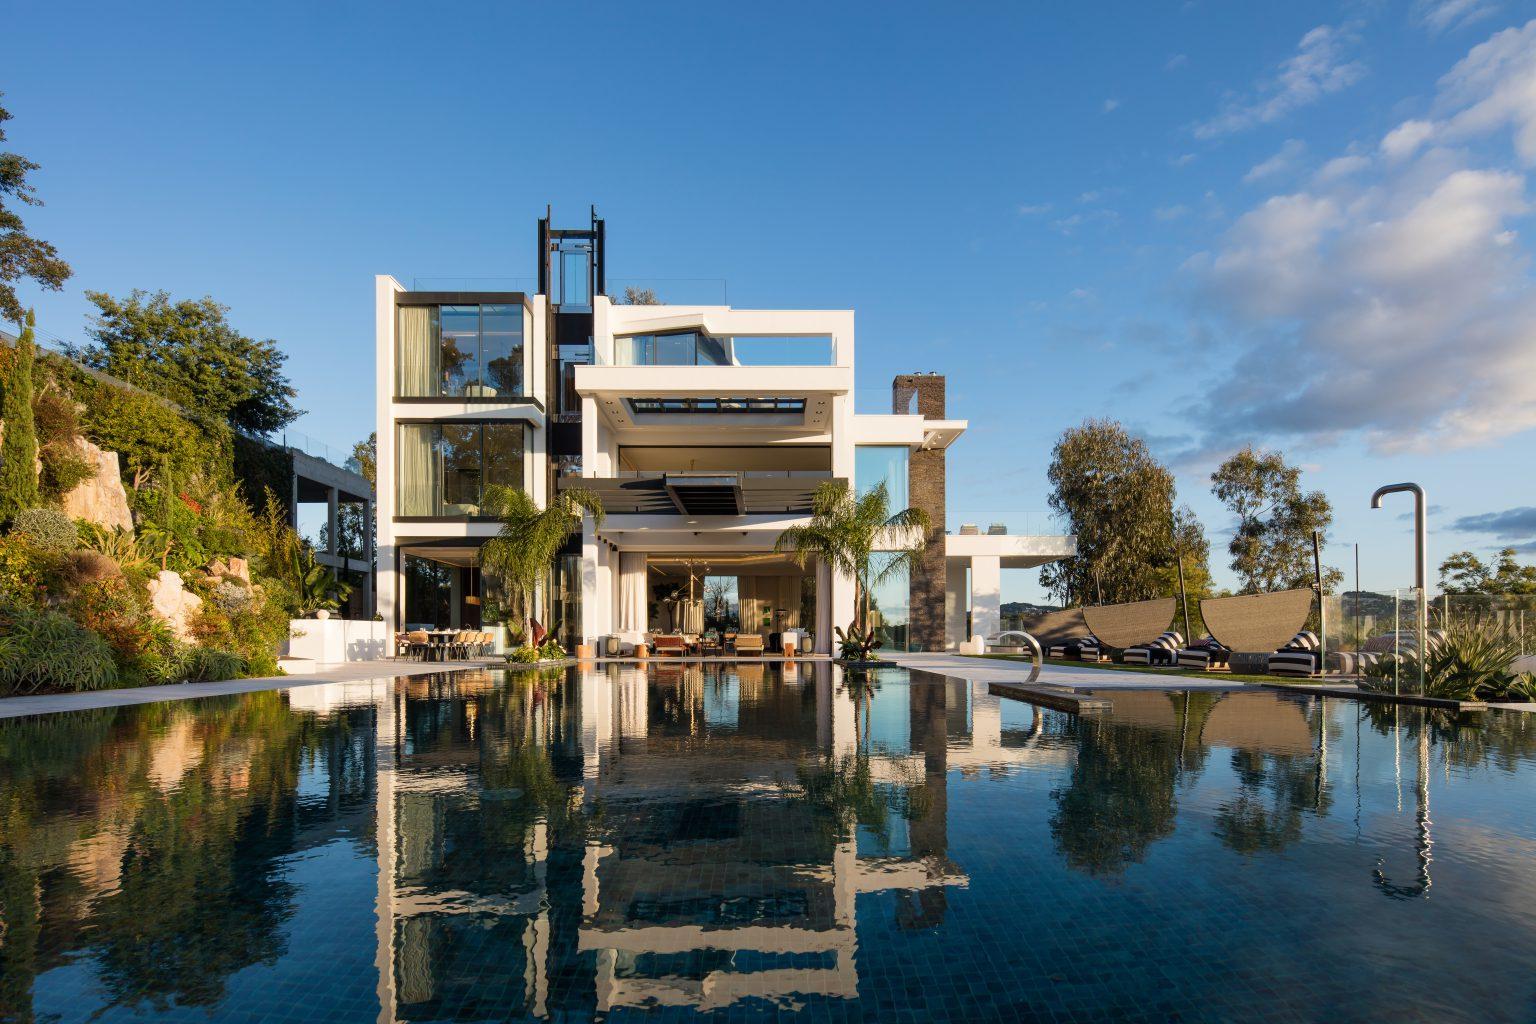 2_villa luxe cannes piscine